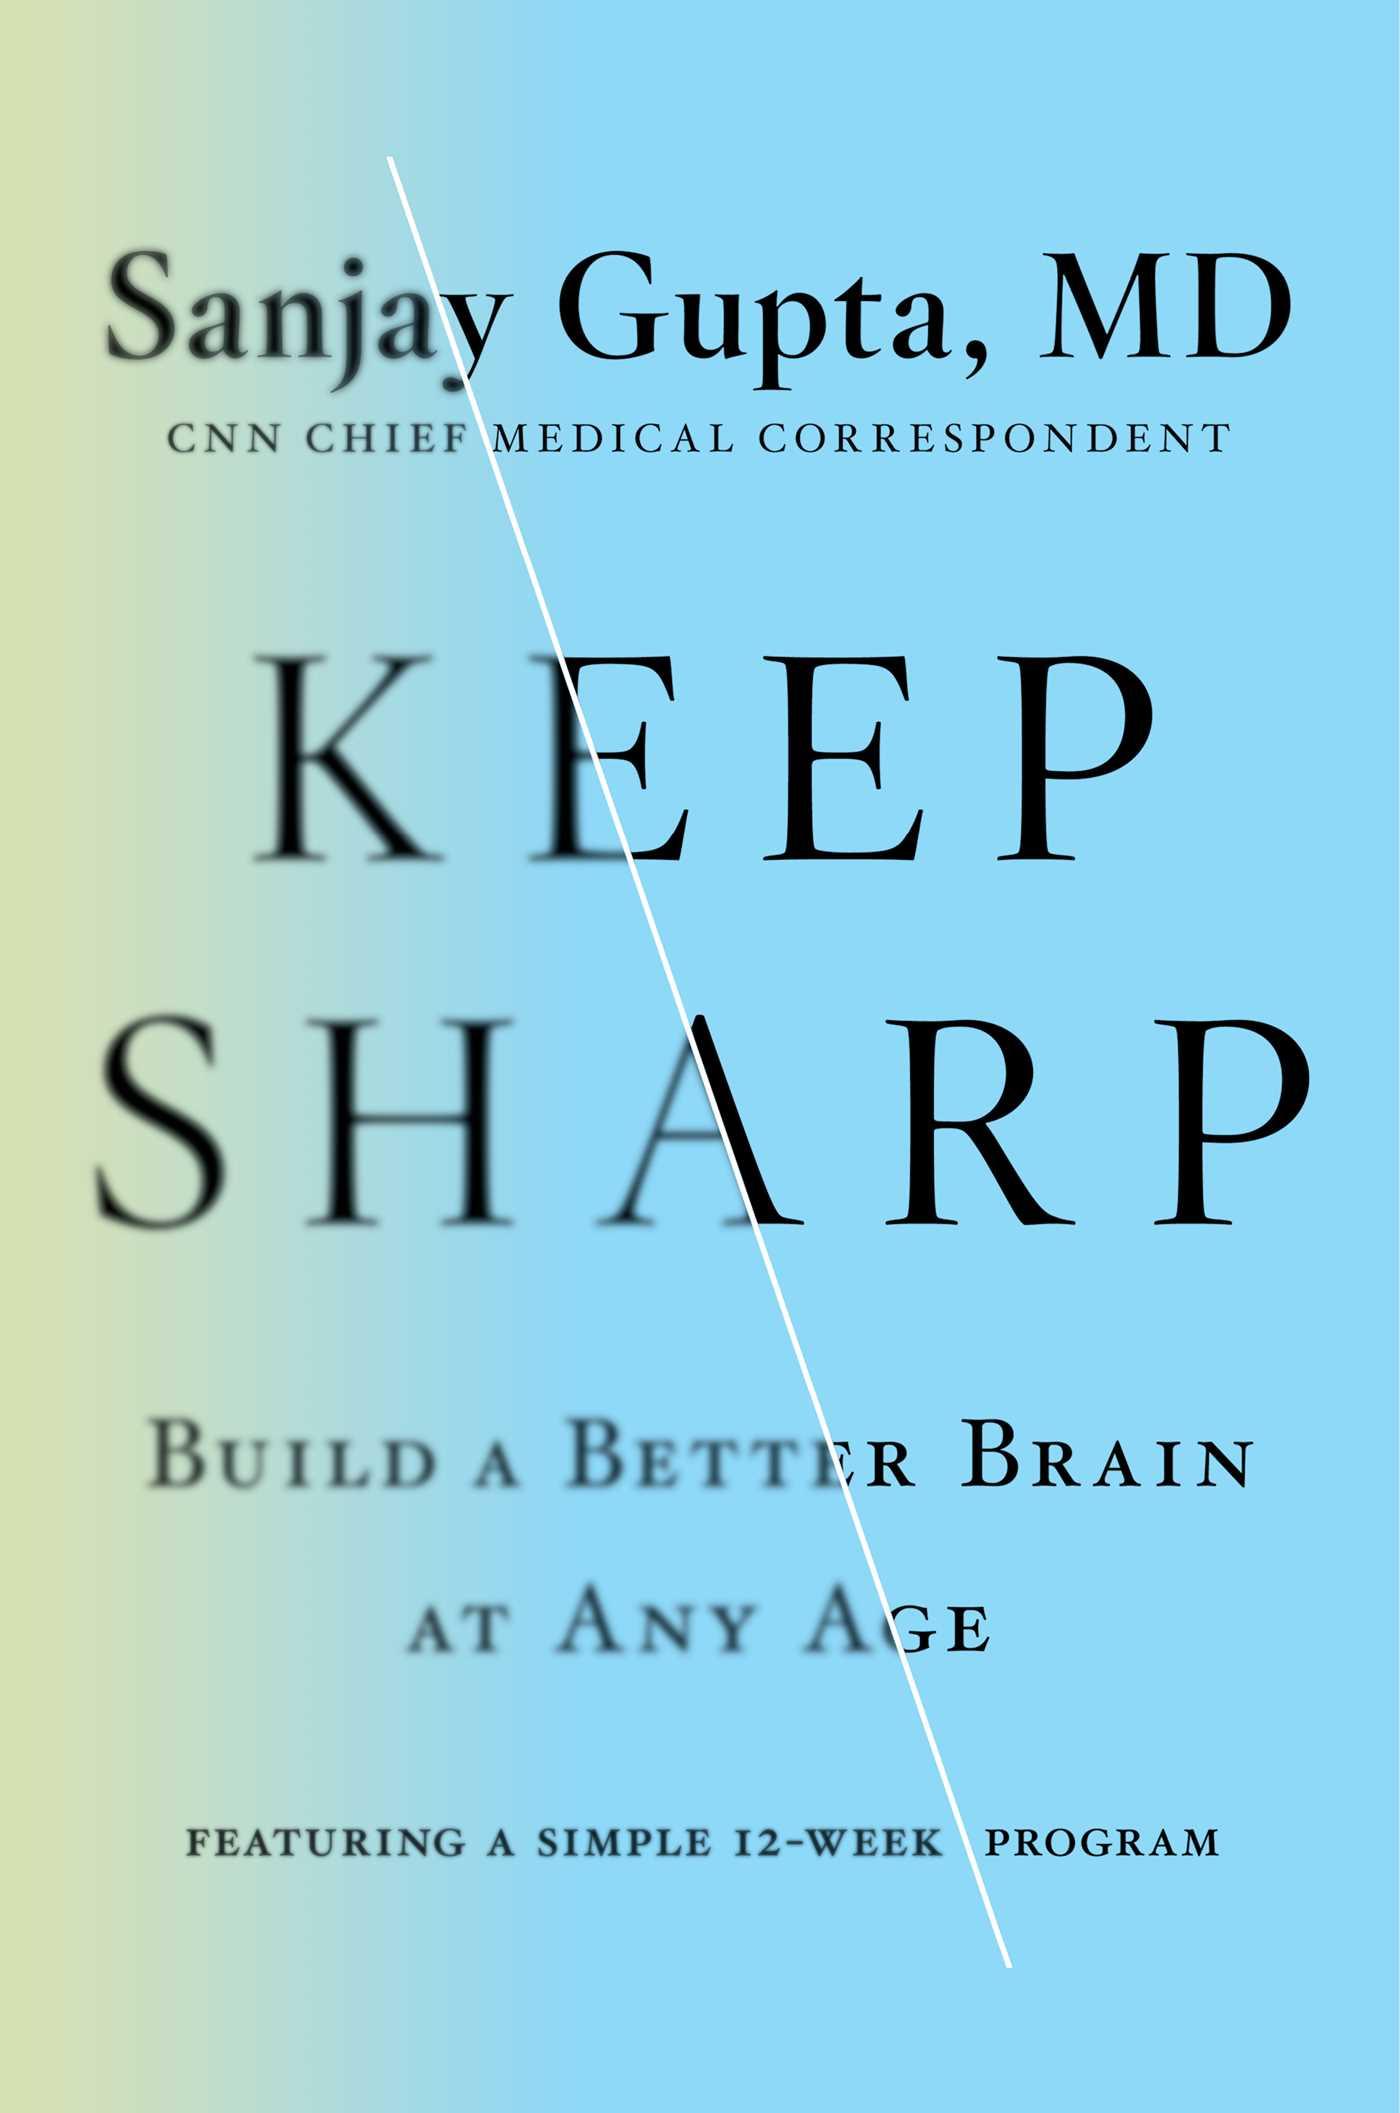 Keep Sharp: Build a Better Brain at Any Age by Sanjay Gupta, MD with Kristin Loberg